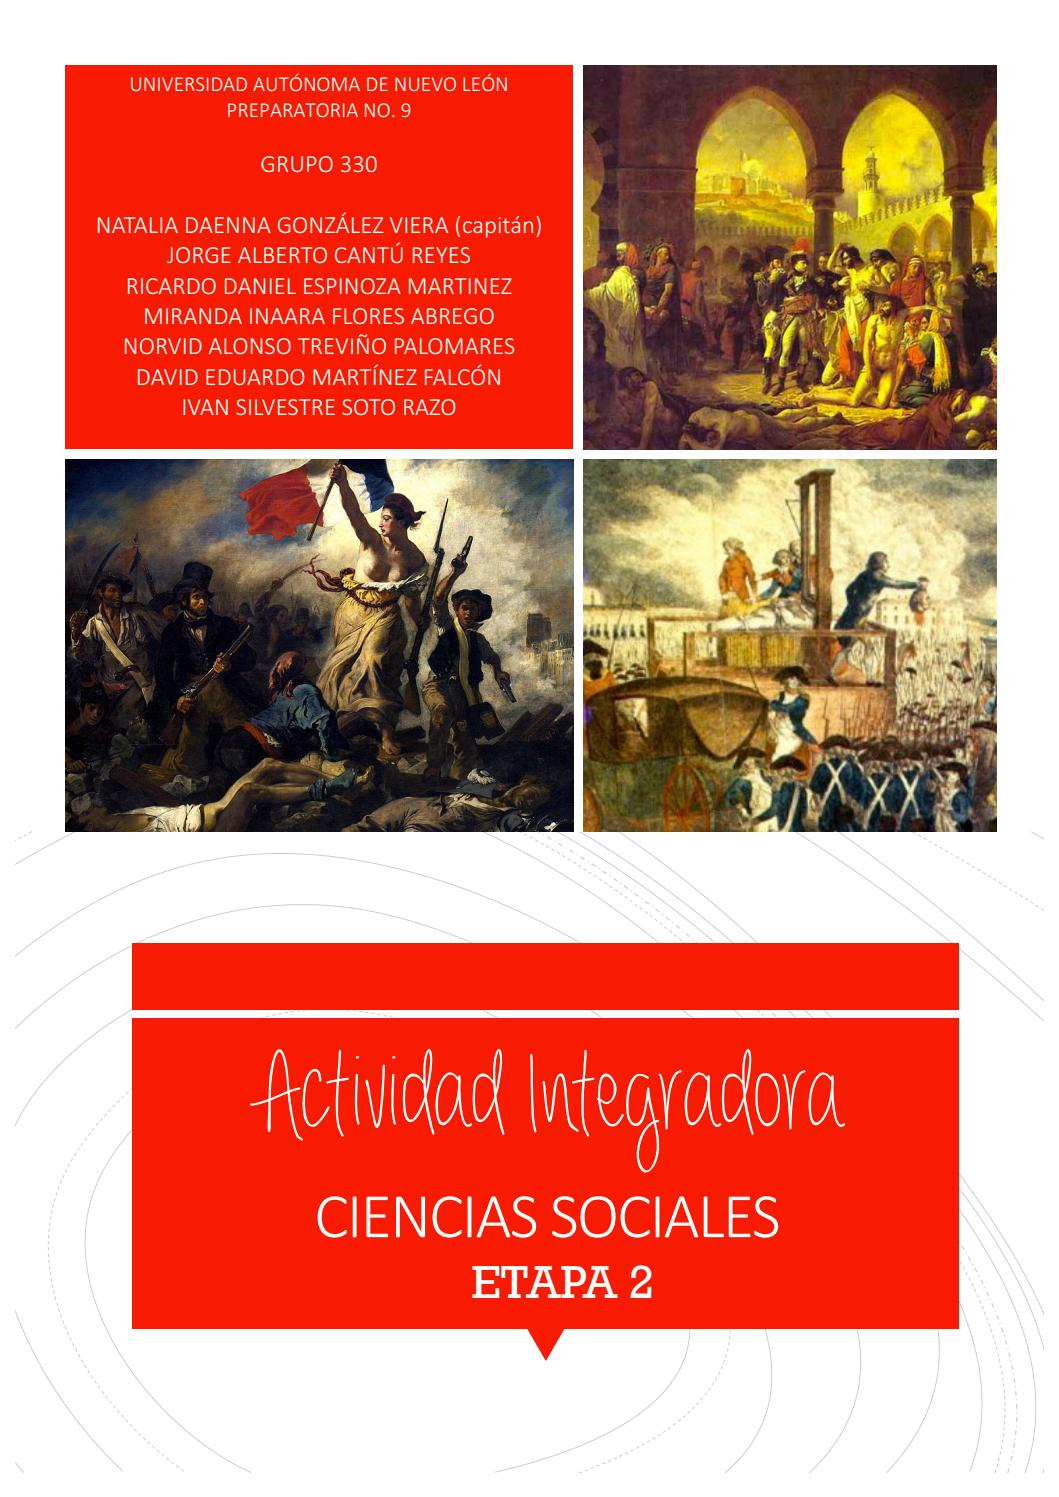 CienciasSociales-Actividad Integradora-Etapa2 by Daenna González ...